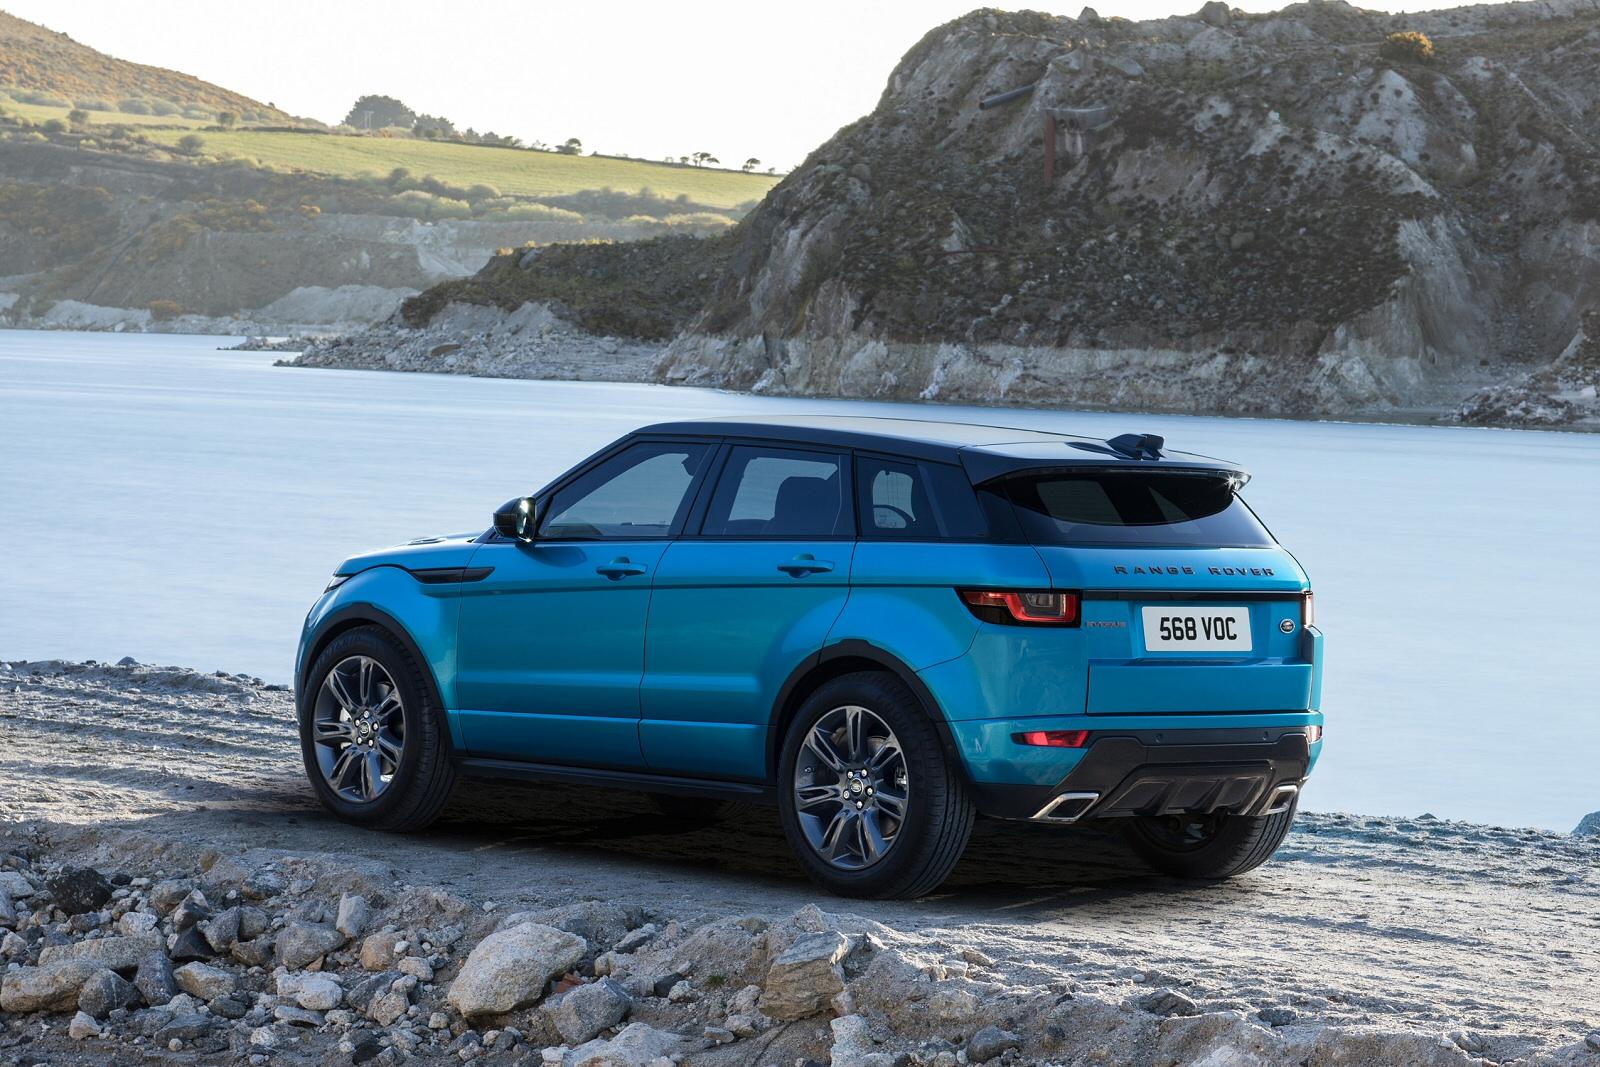 models rover autoweek land range vehicles fujiwhite car reviews two recalls news landrover and sport